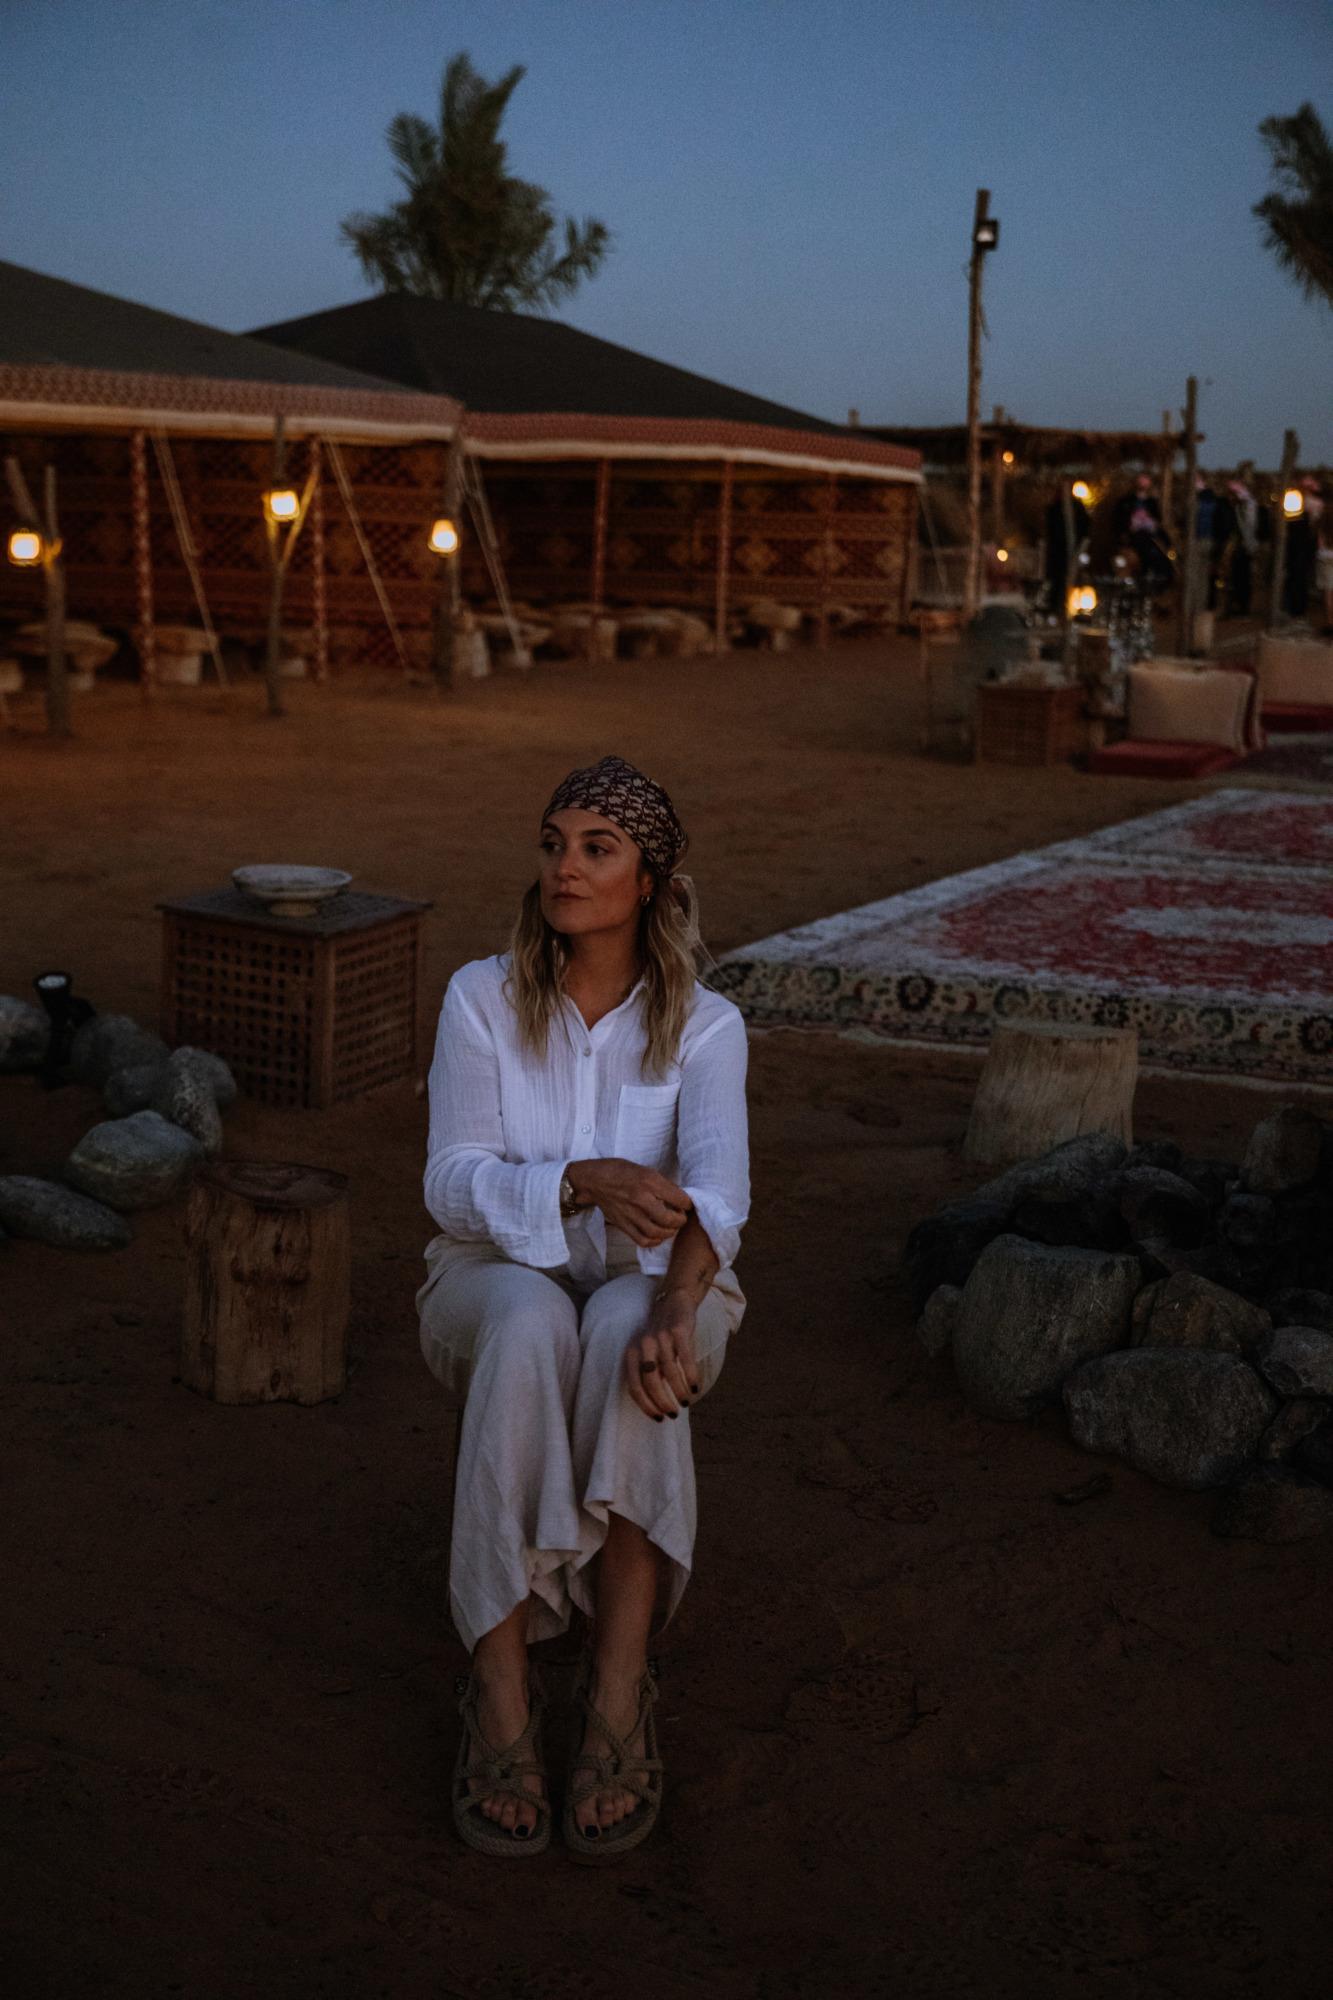 Safari avec Platinum Heritage Dubaï - Blondie Baby blog voyages